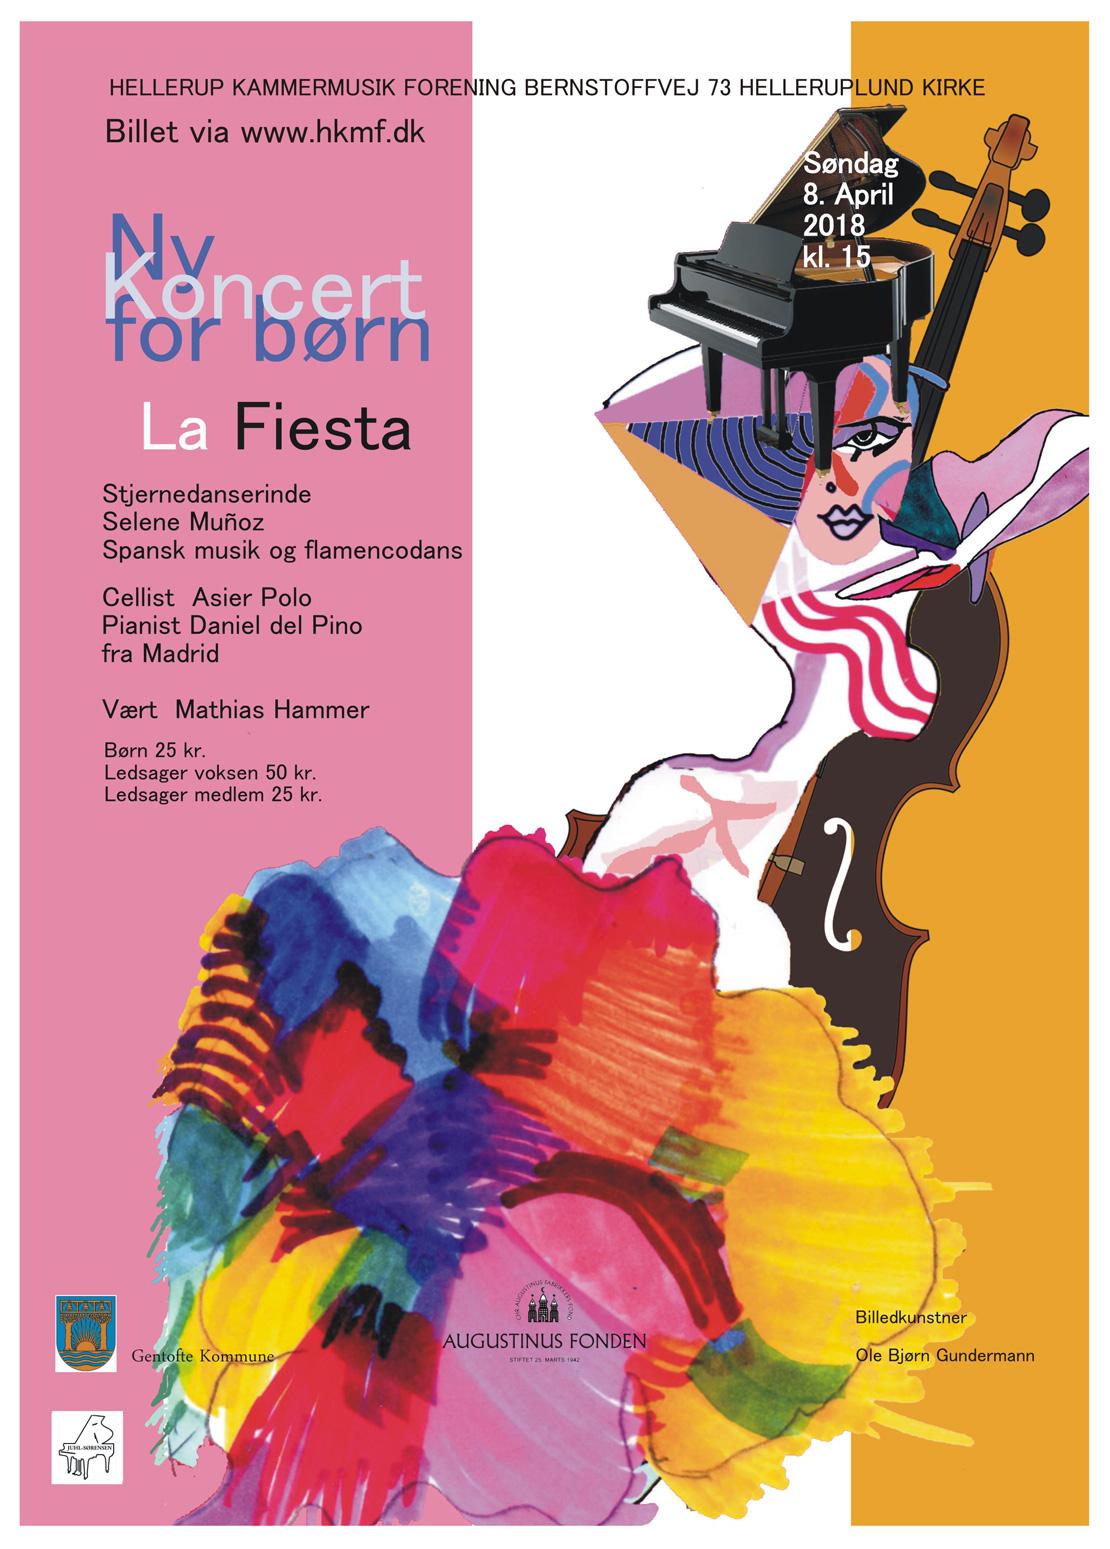 hkmf-koncert-for-born-la-fiesta